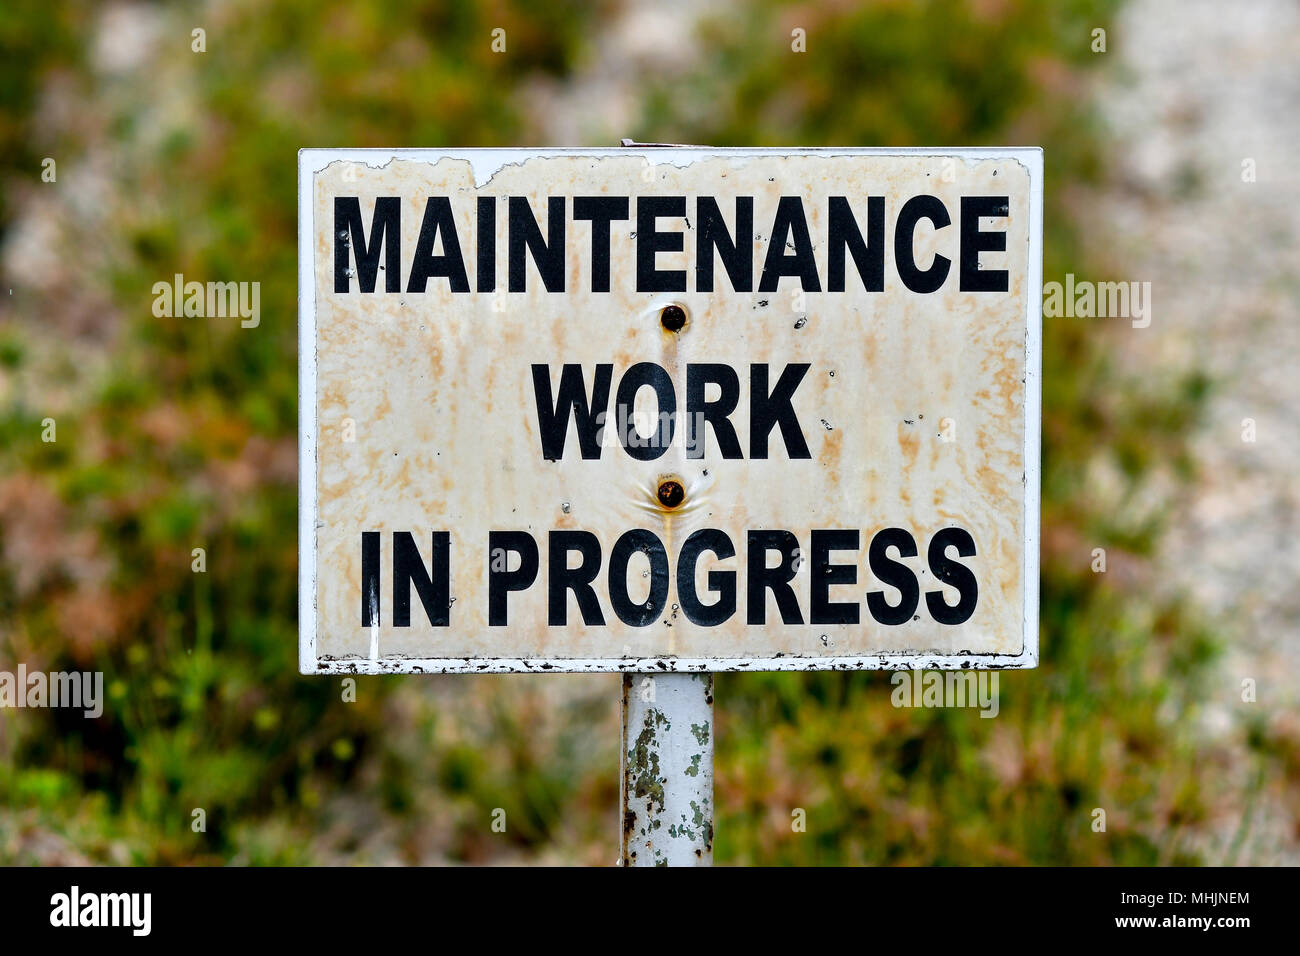 Maintenance work in progress sign board - Stock Image